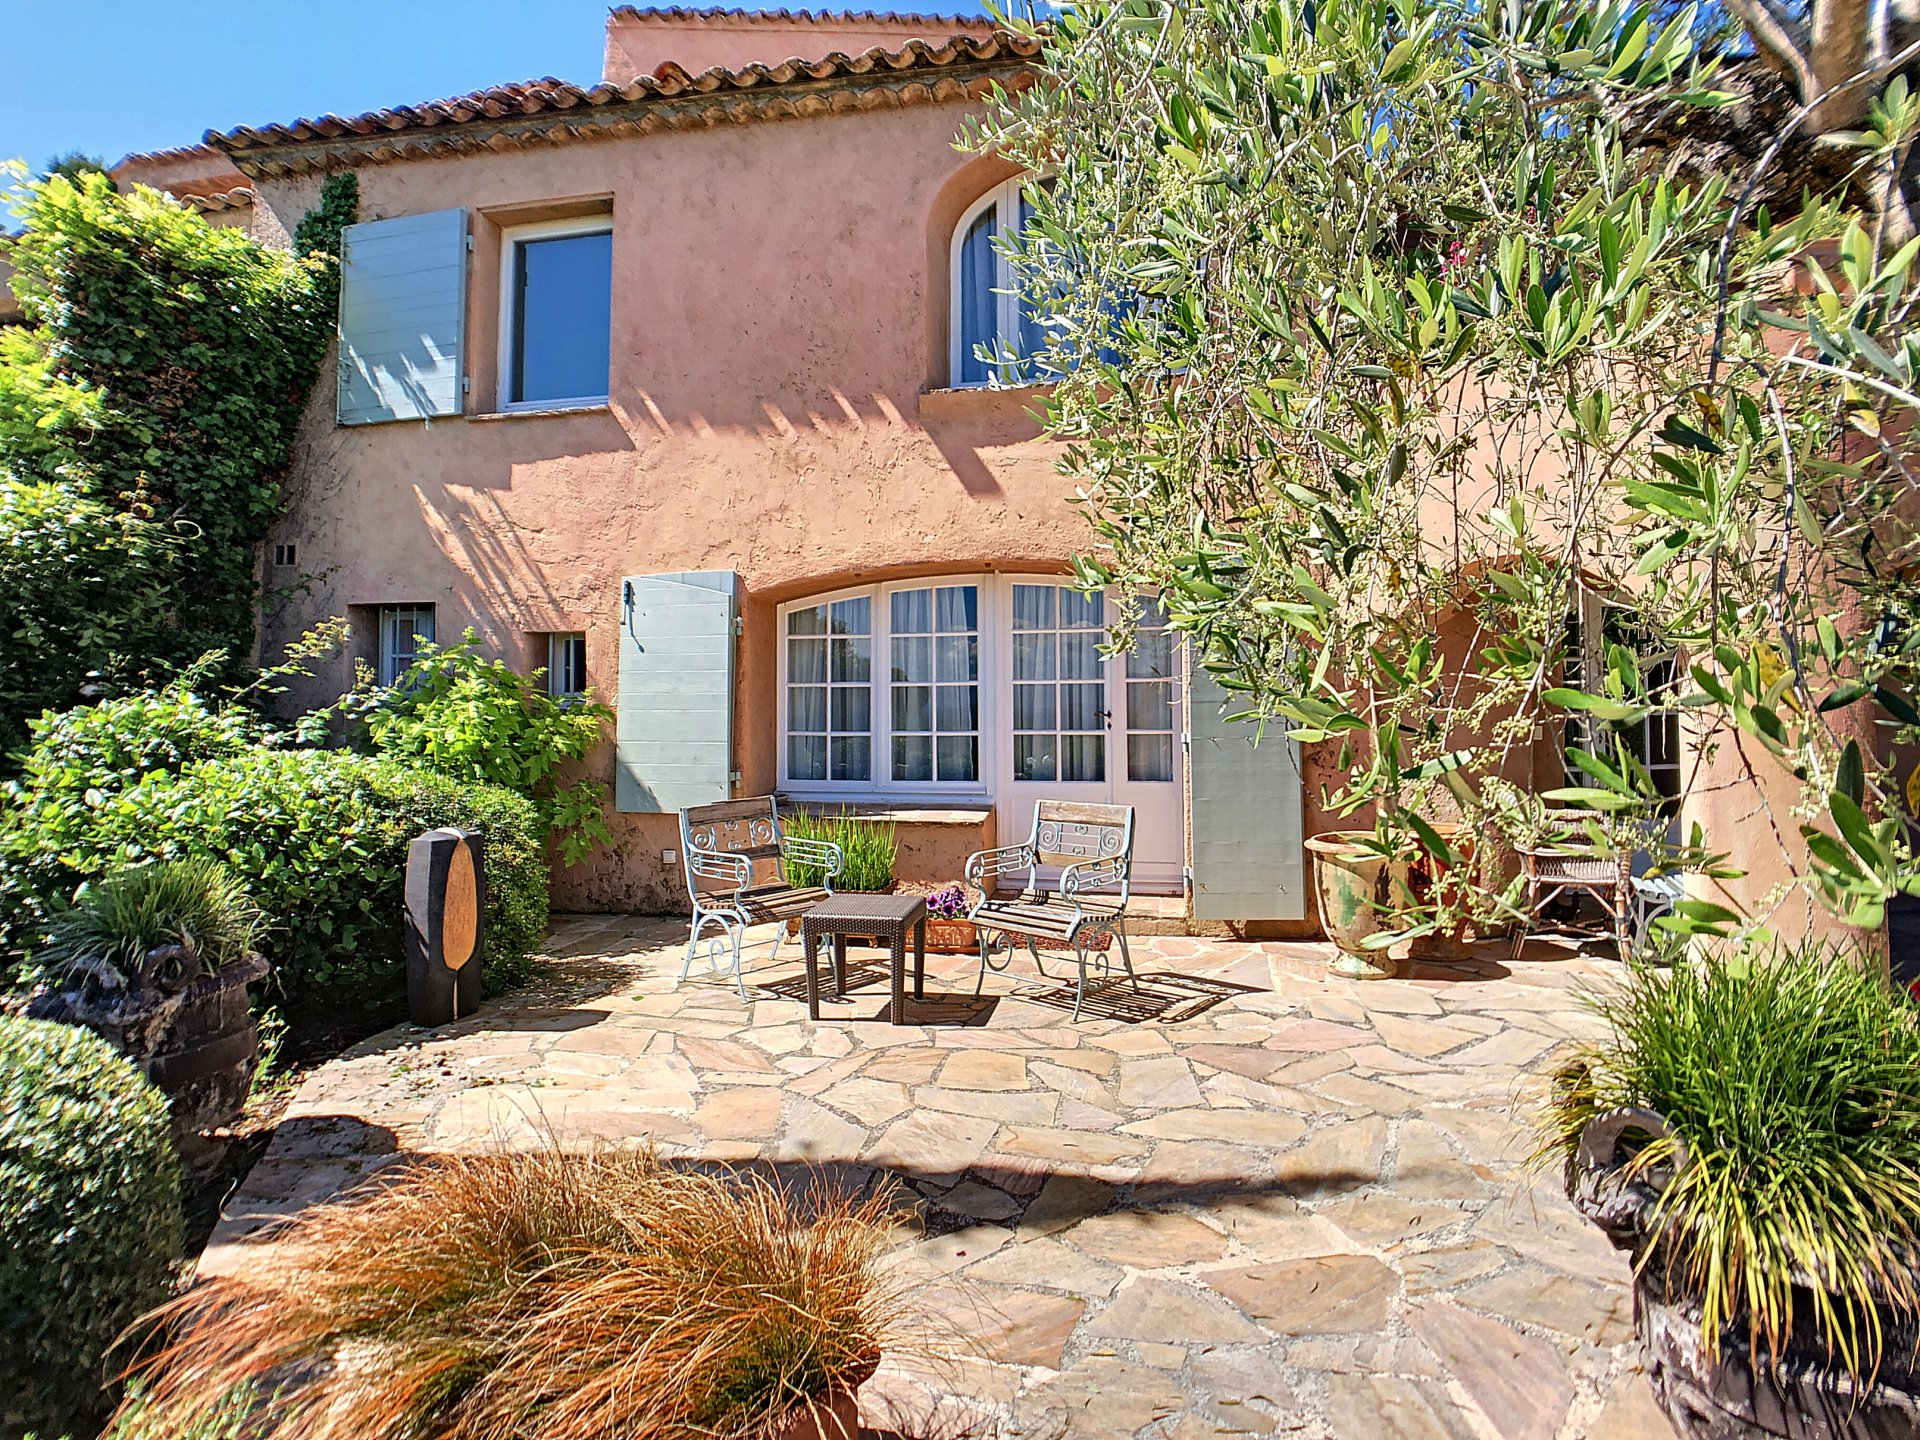 Castellaras - Exceptional property